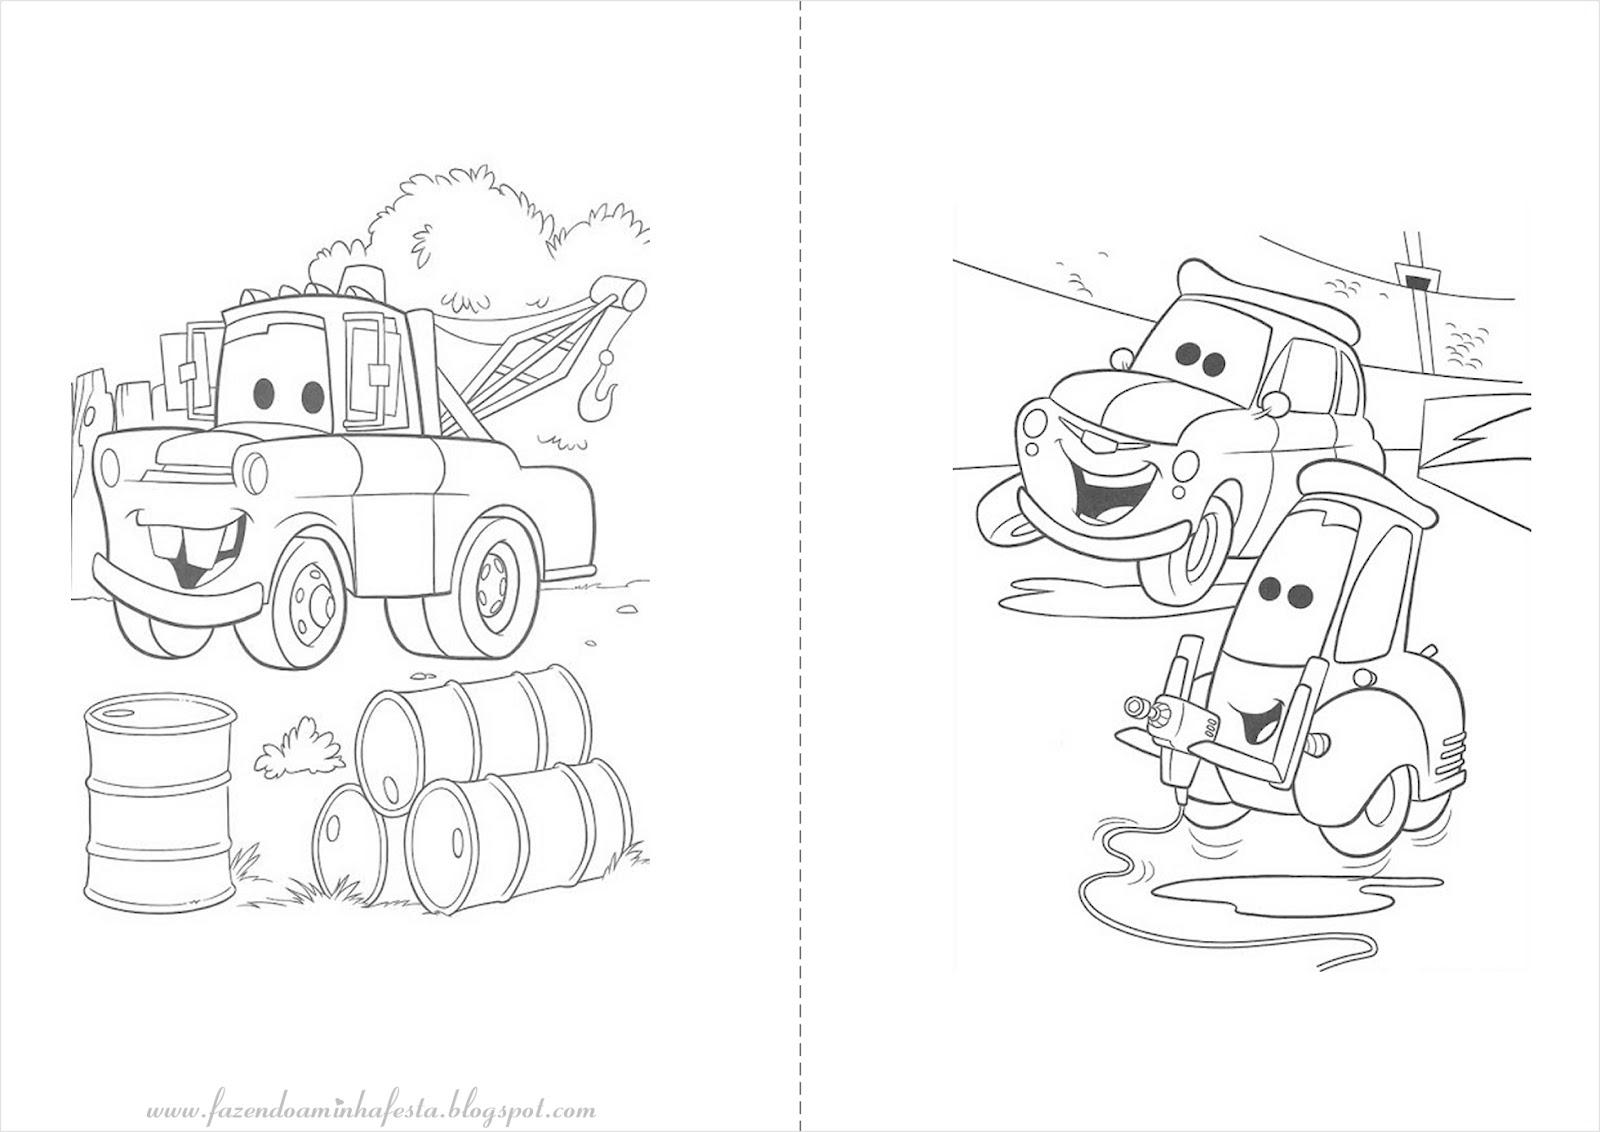 Desenhos de carros para colorir Desenhos para Colorir